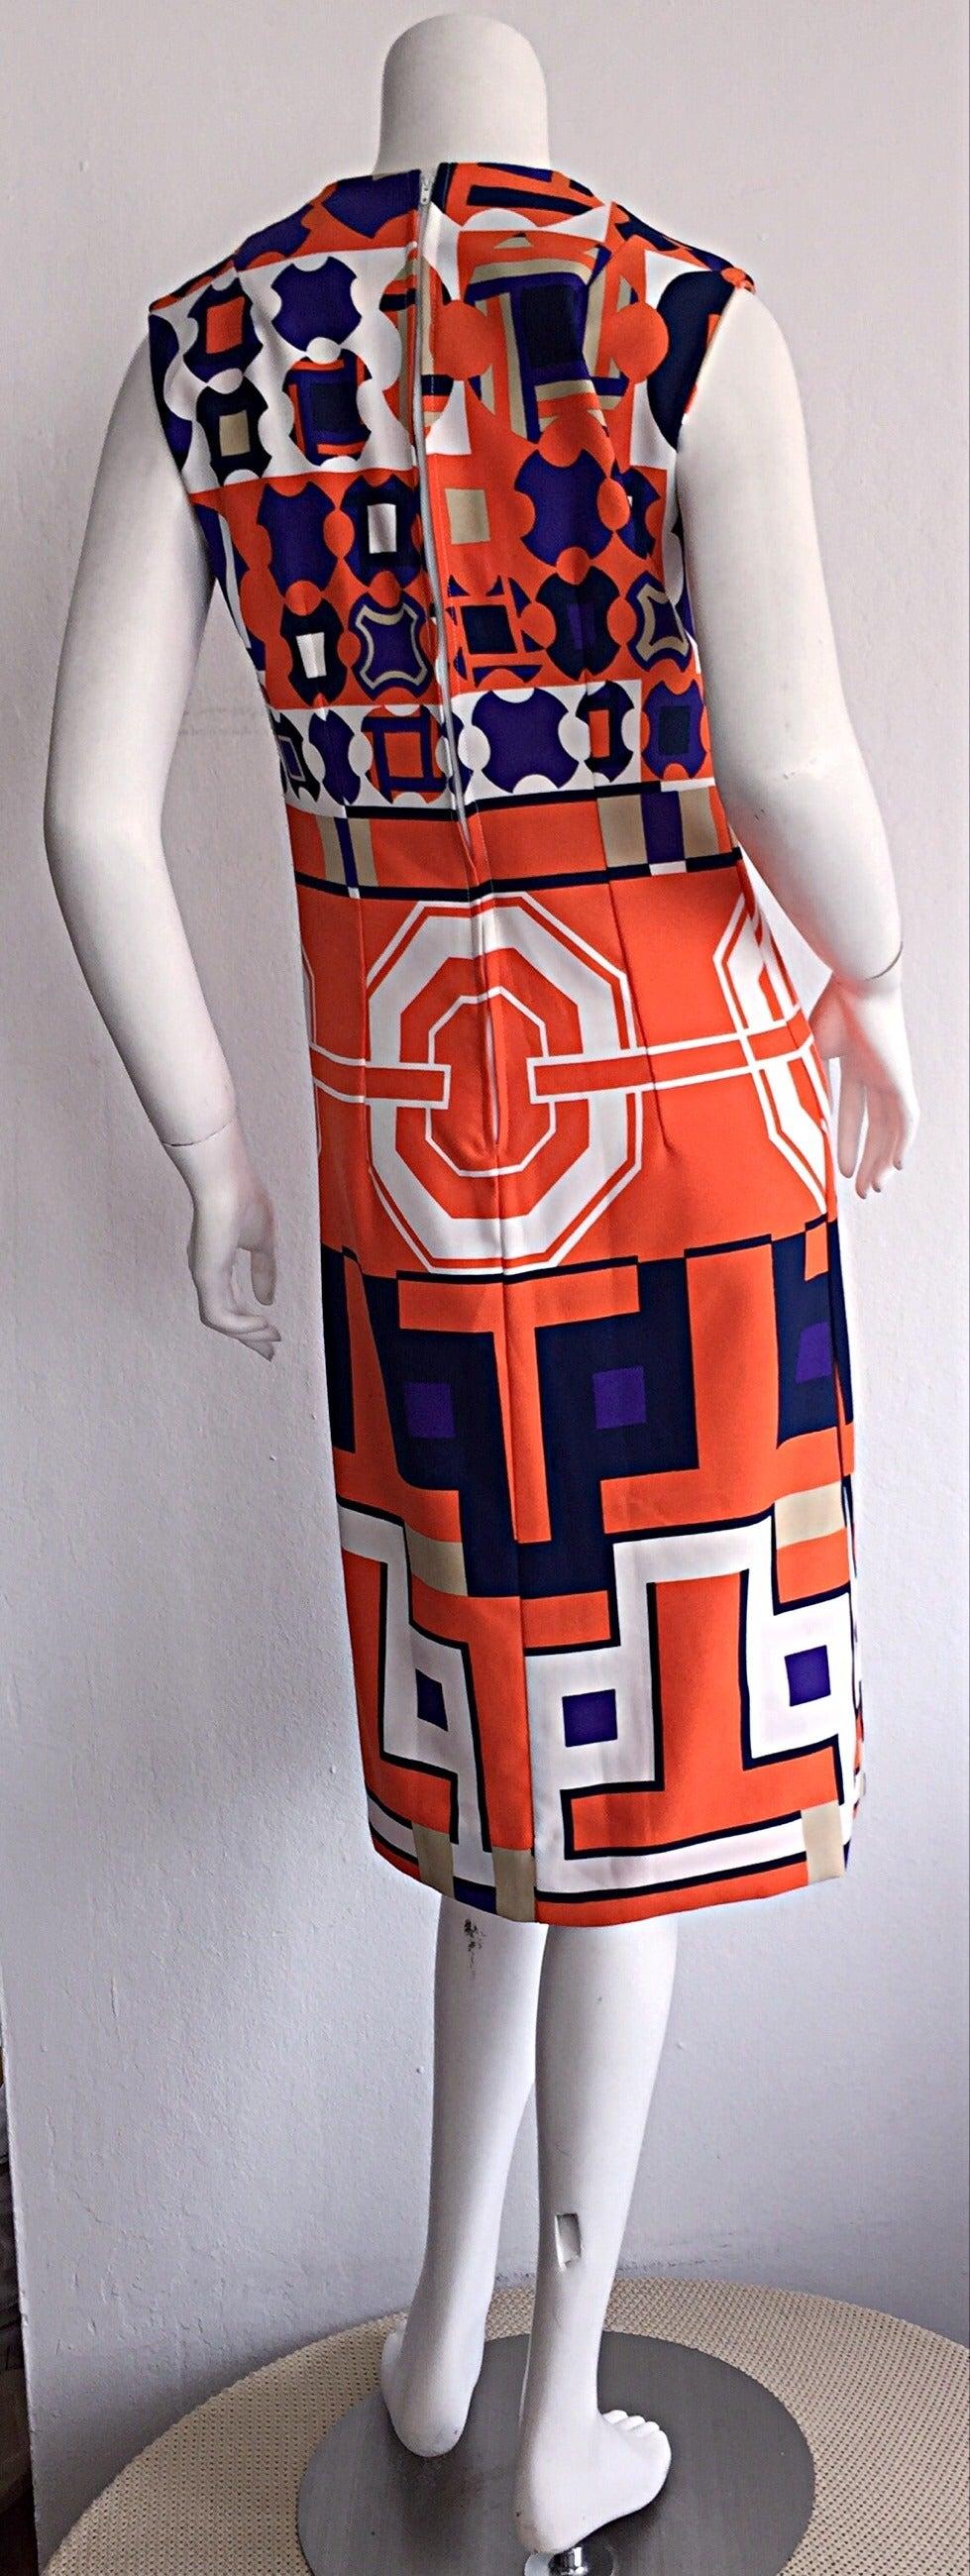 1960s Vintage Lanvin Op - Art Geometric Mod ' Buckle ' Print Shift 3 - D Dress 7